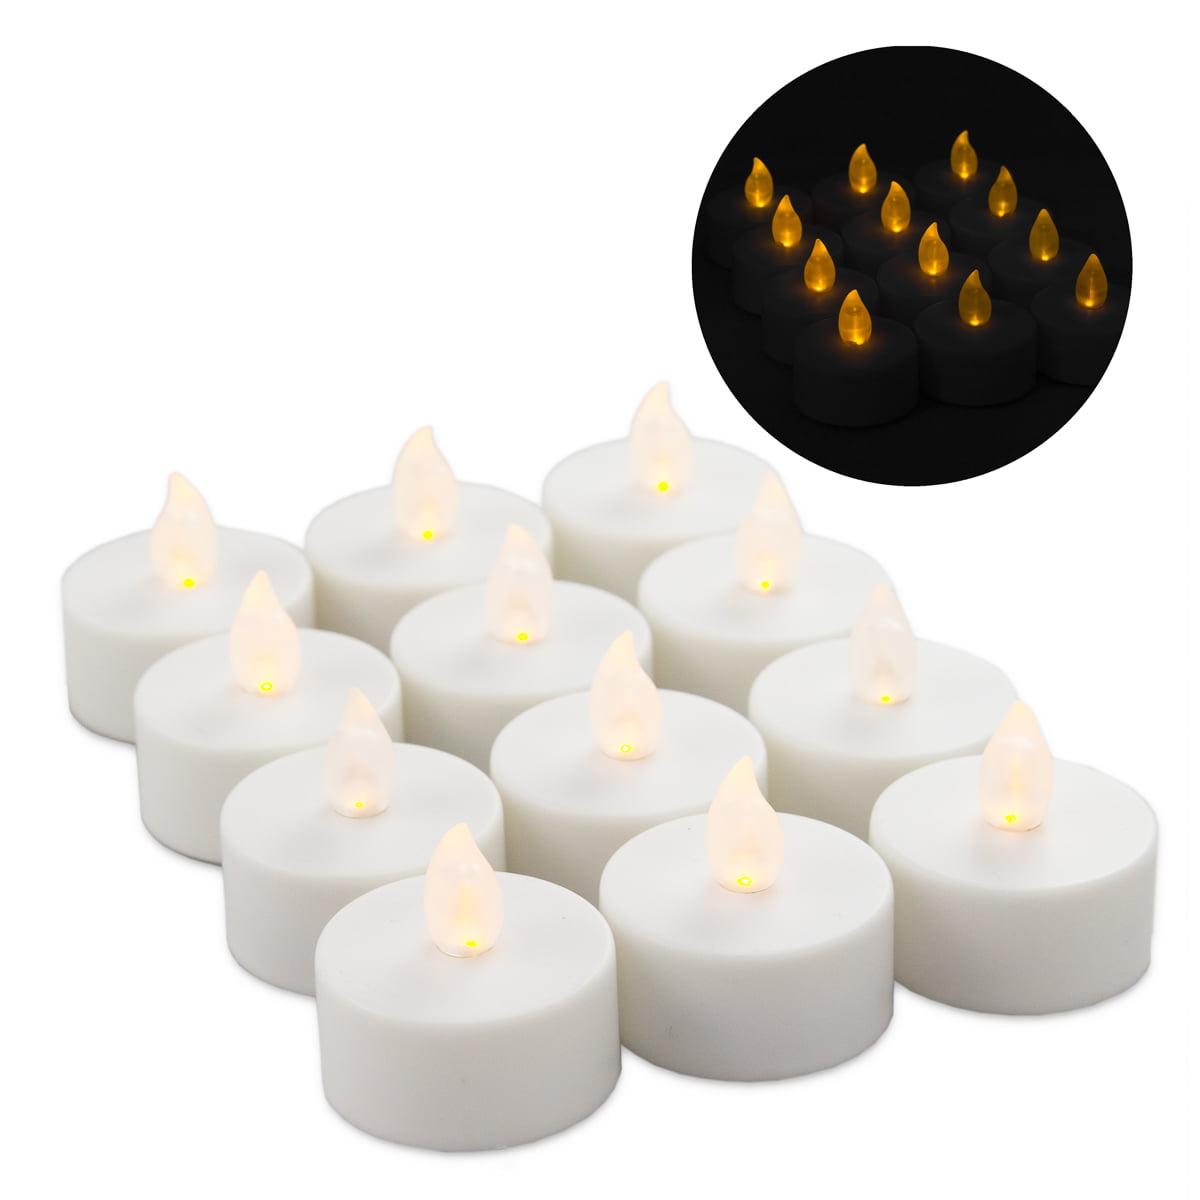 12 LED Tea Lights Votives Battery Operated Flameless Flickering Orange Candles